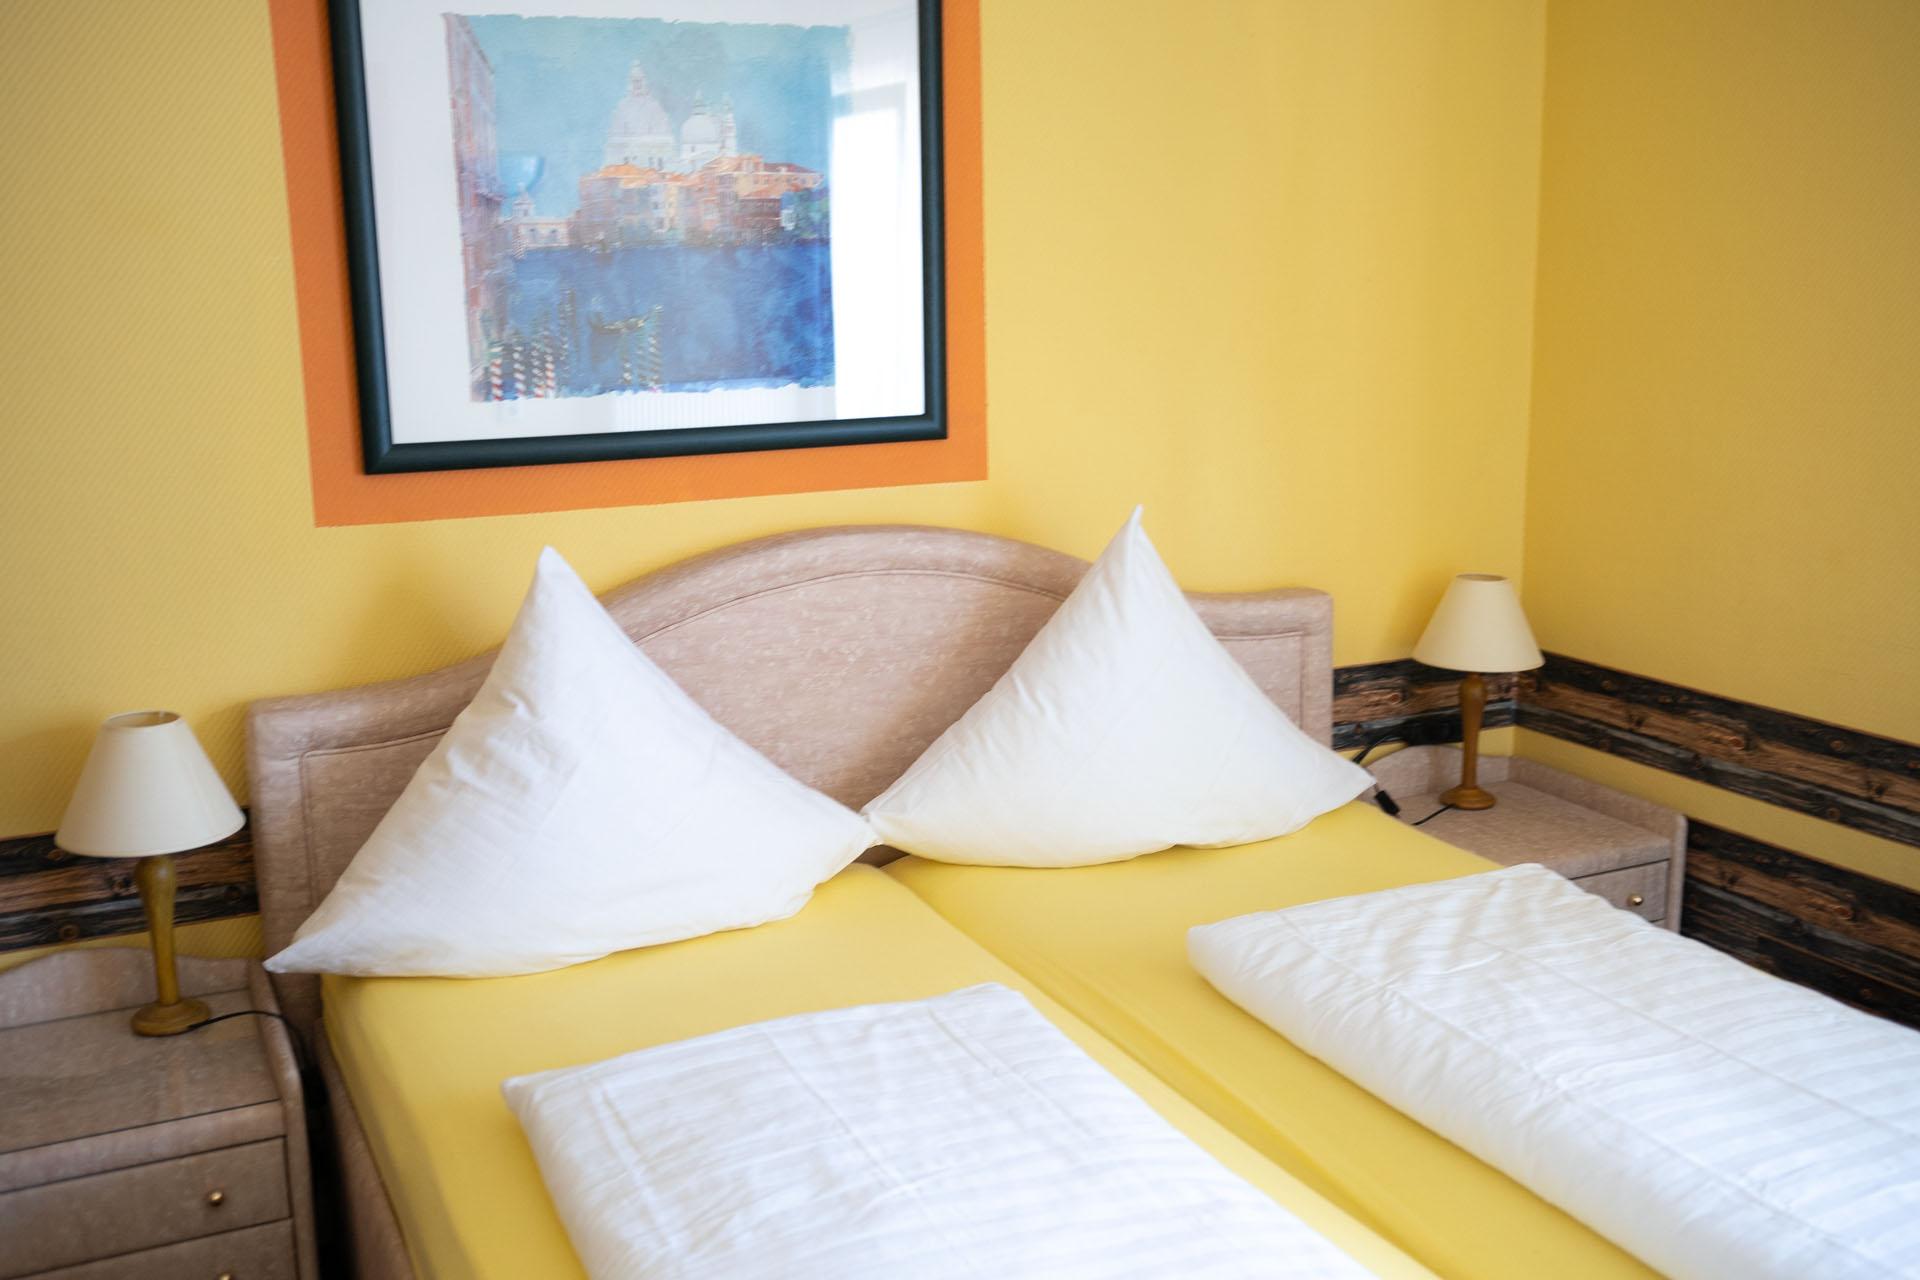 Hotel_Aggertal_Zimmer_Doppelzimmer02